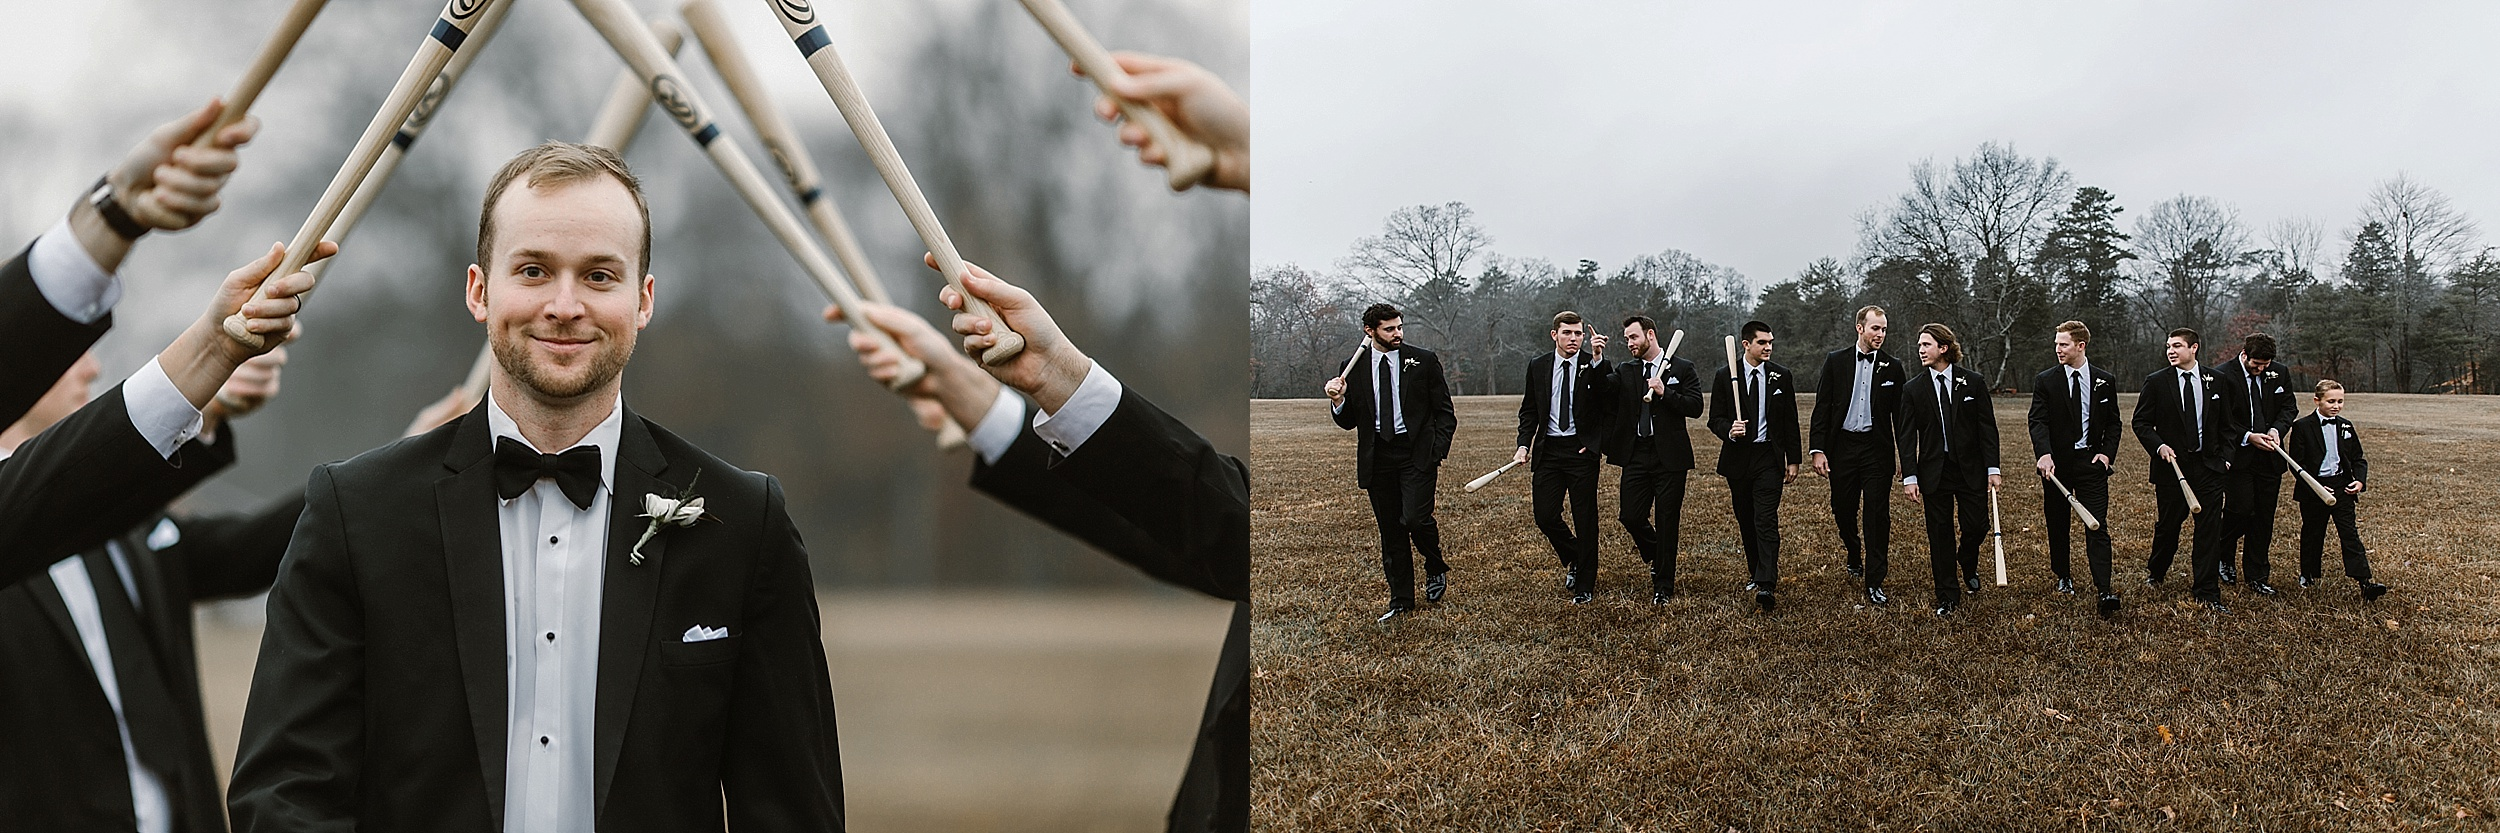 knoxville-wedding-groomsmen-2